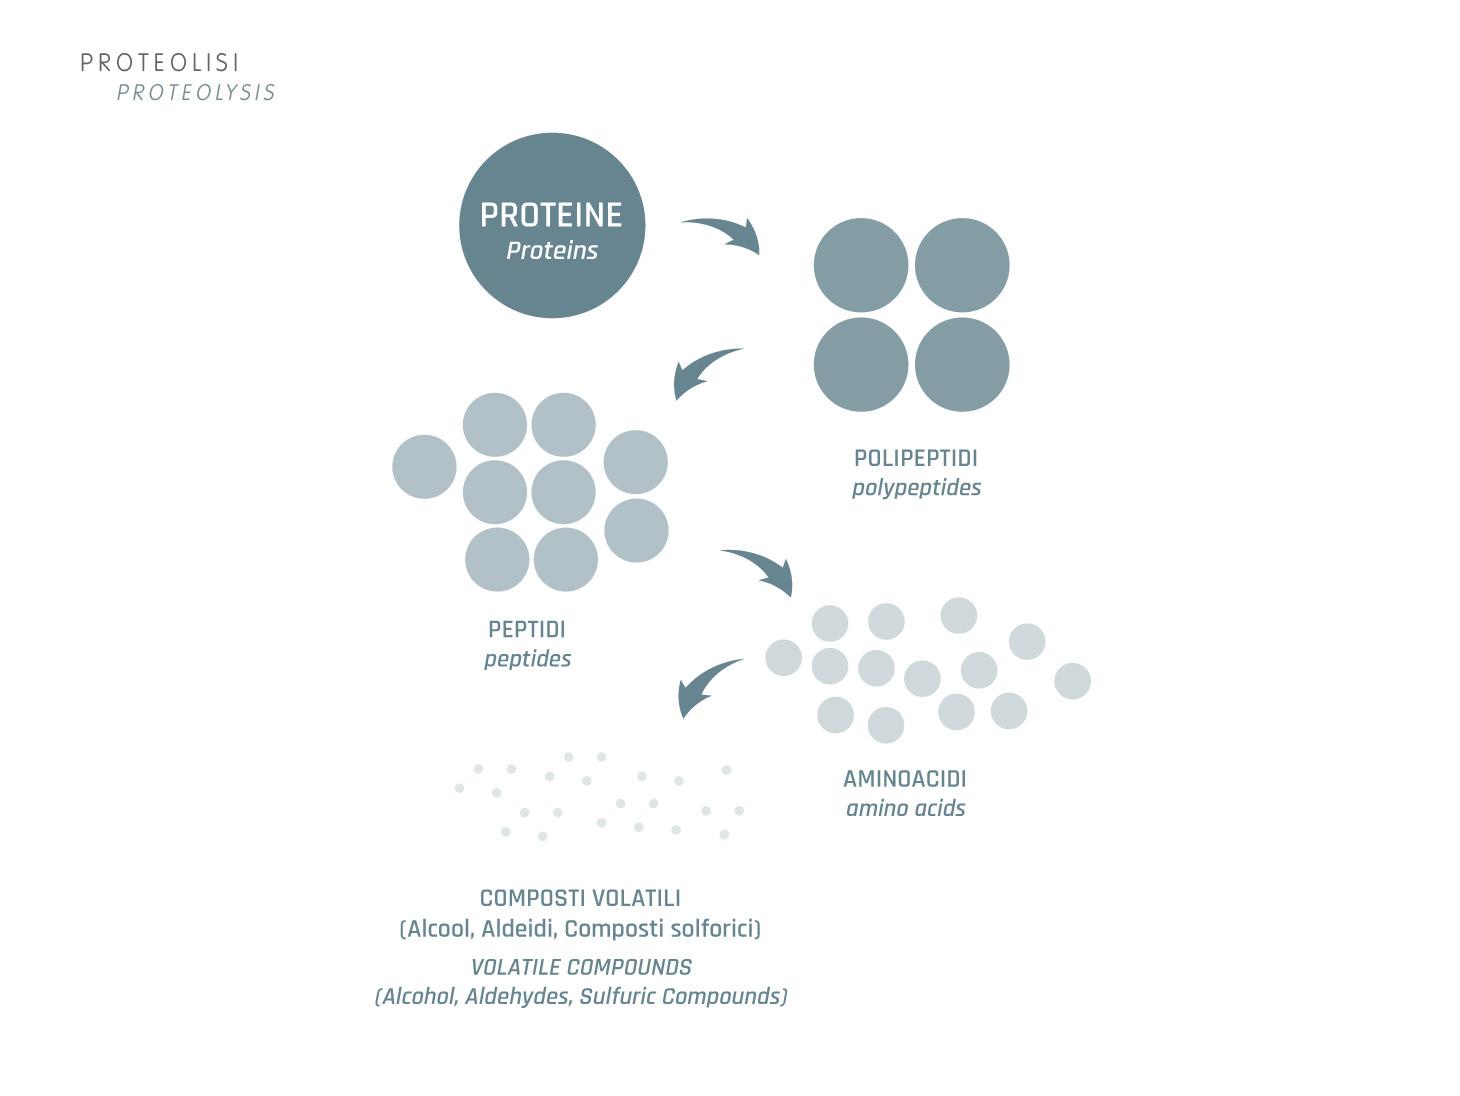 Affinamento: proteolisi